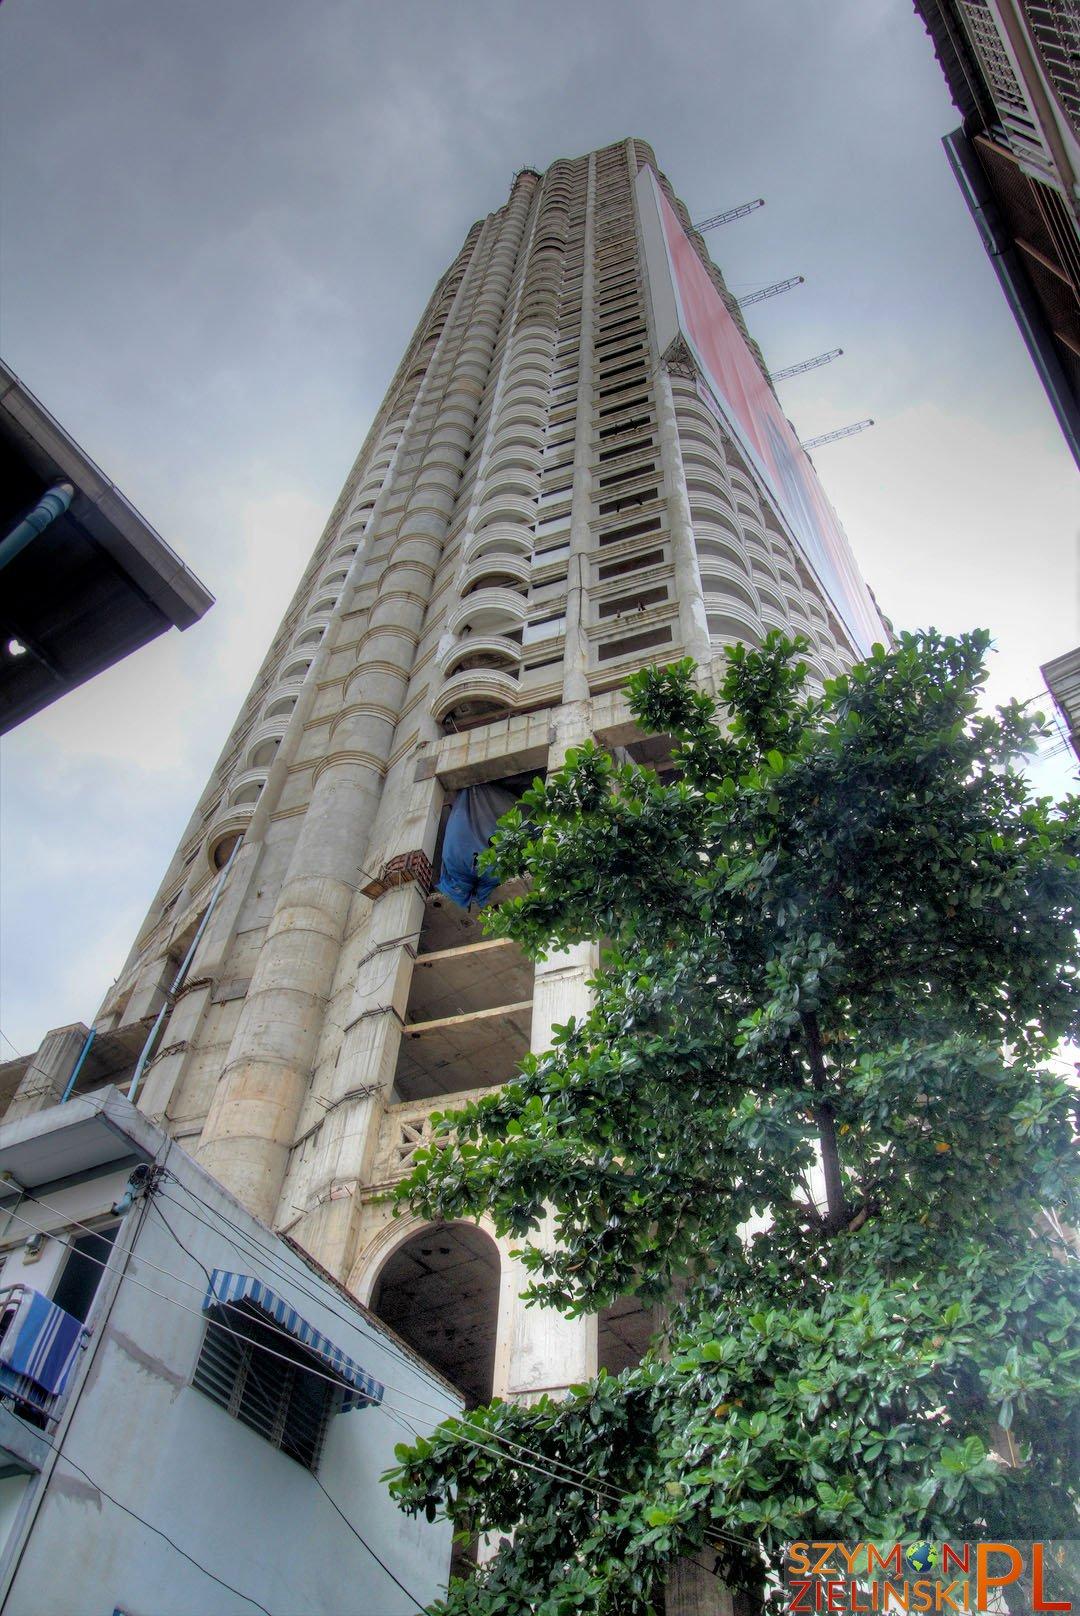 Sathorn Unique - Ghost Building, Bangkok, Thailand - Sathiorn Unique - Nawiedzony Budynek, Bangkok, Tajlandia